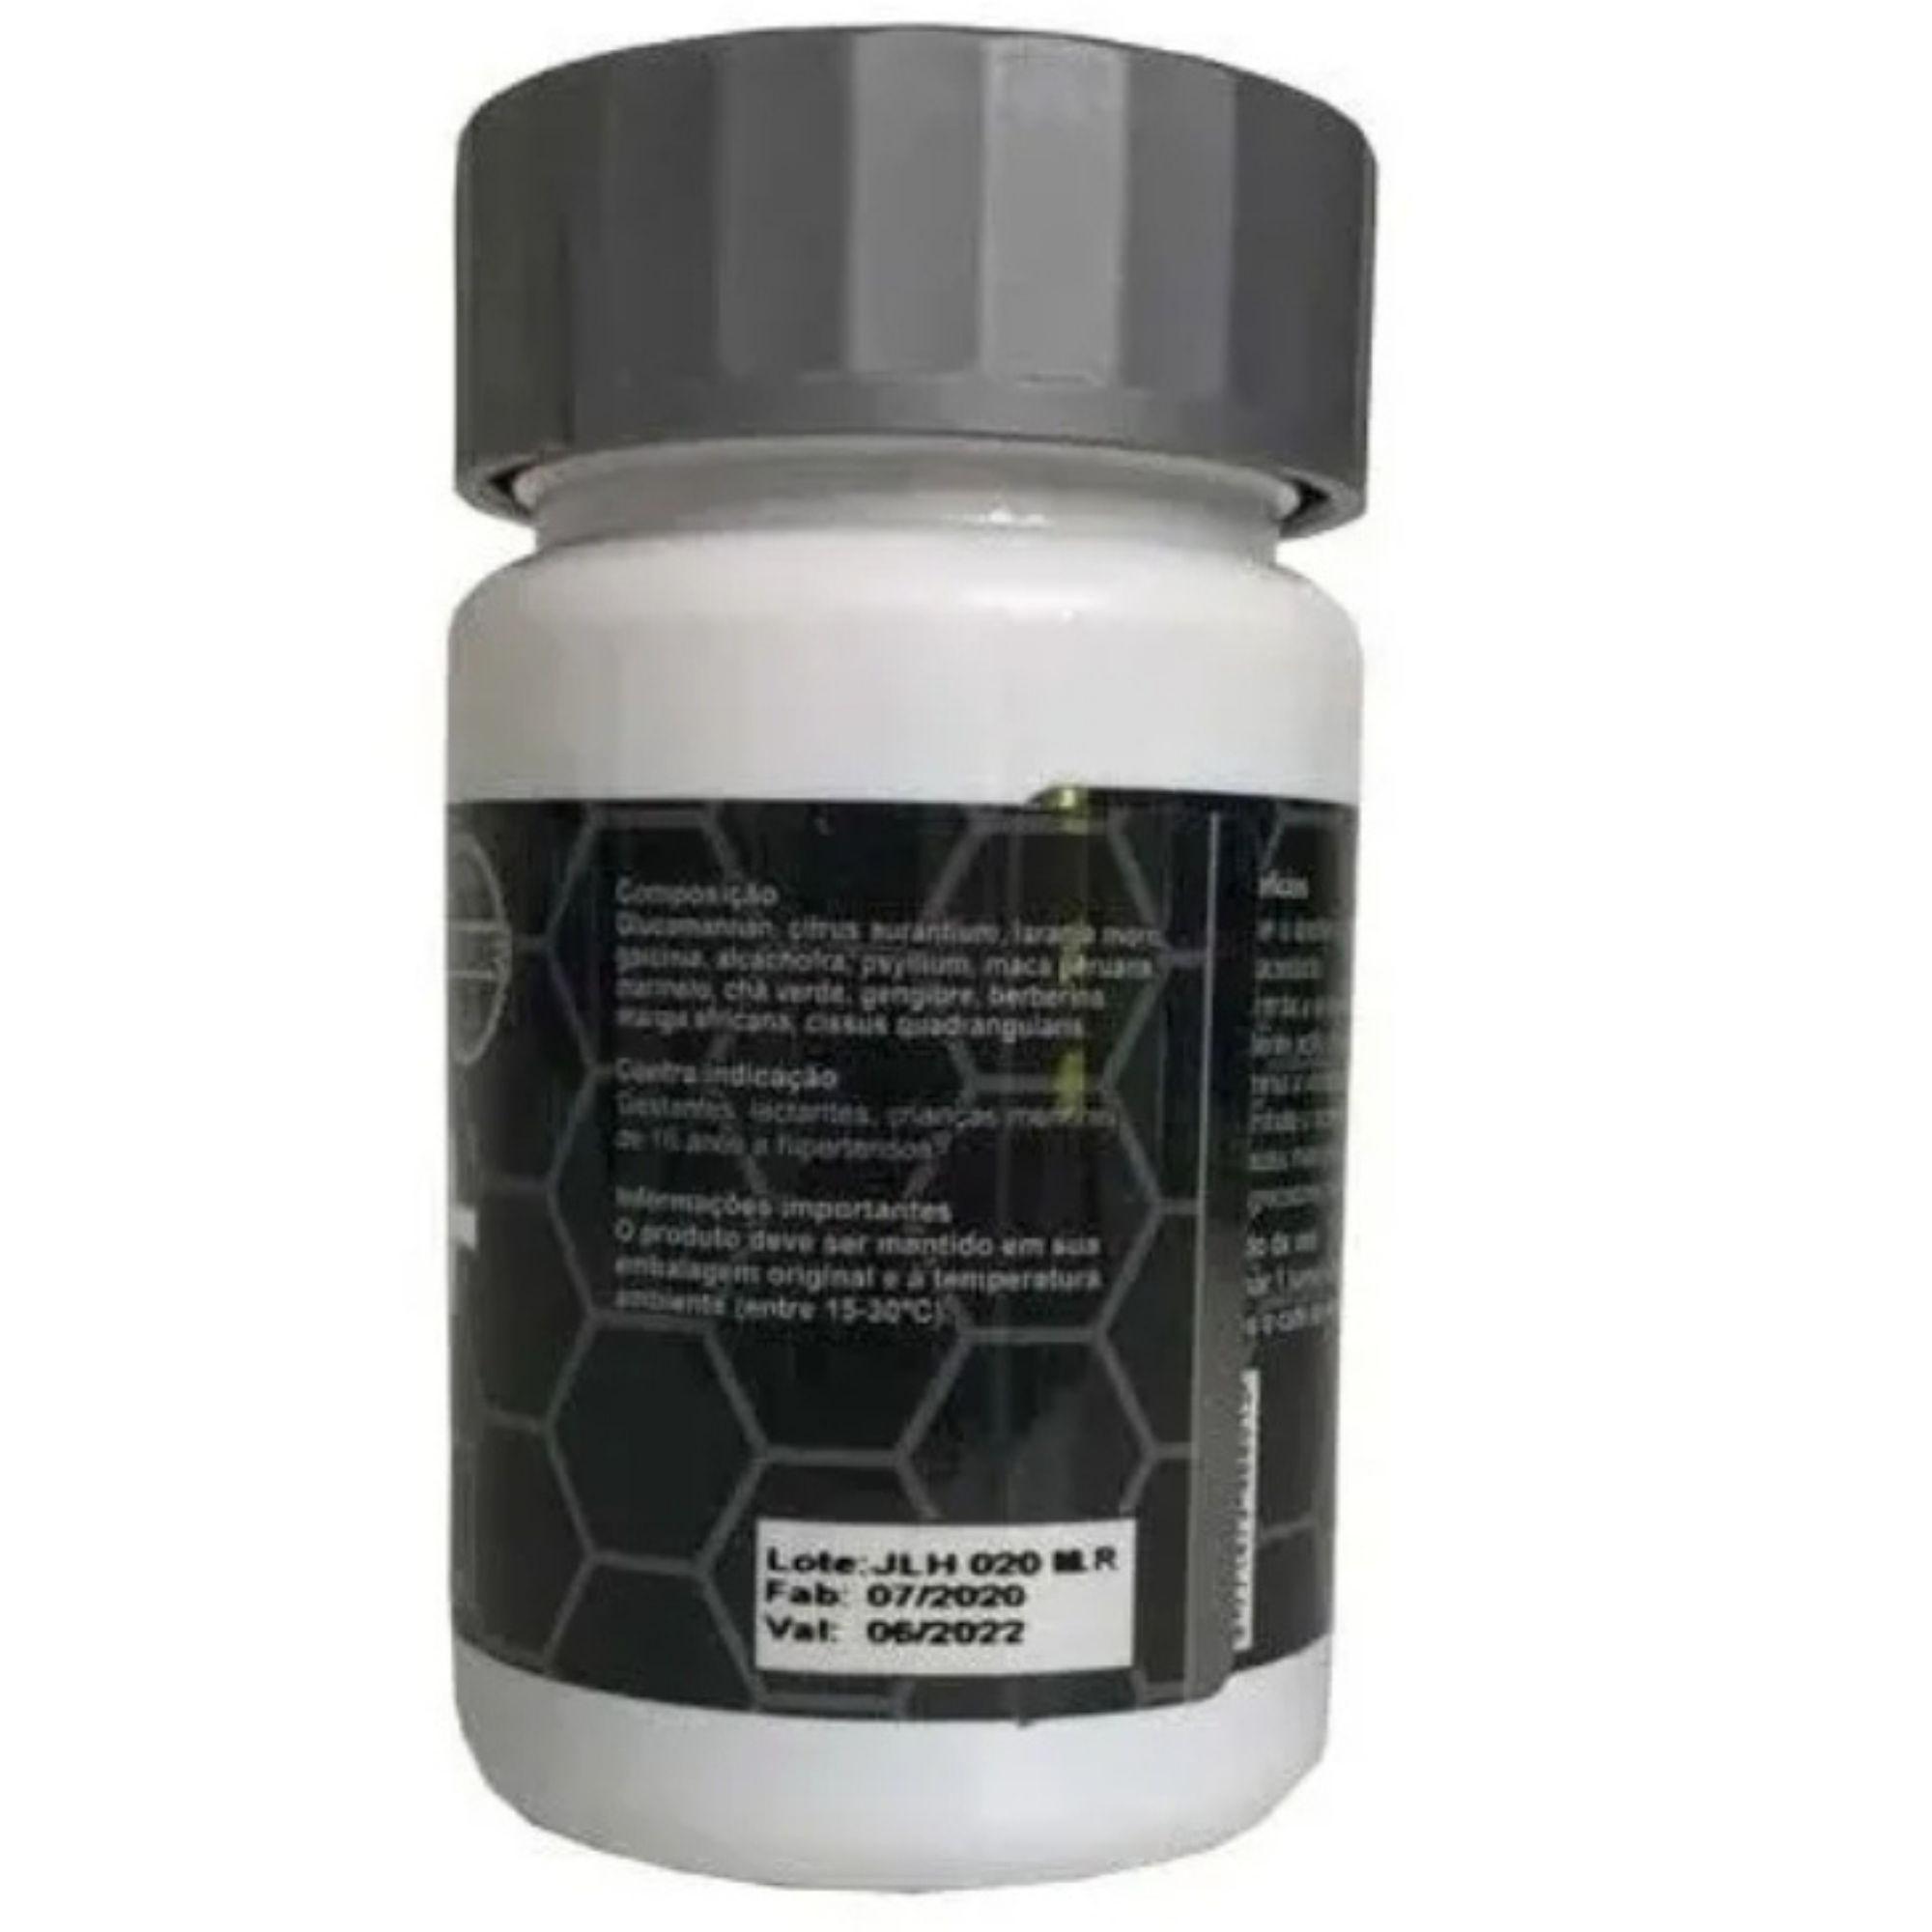 Diet Acelerador (ACCELERATOR)